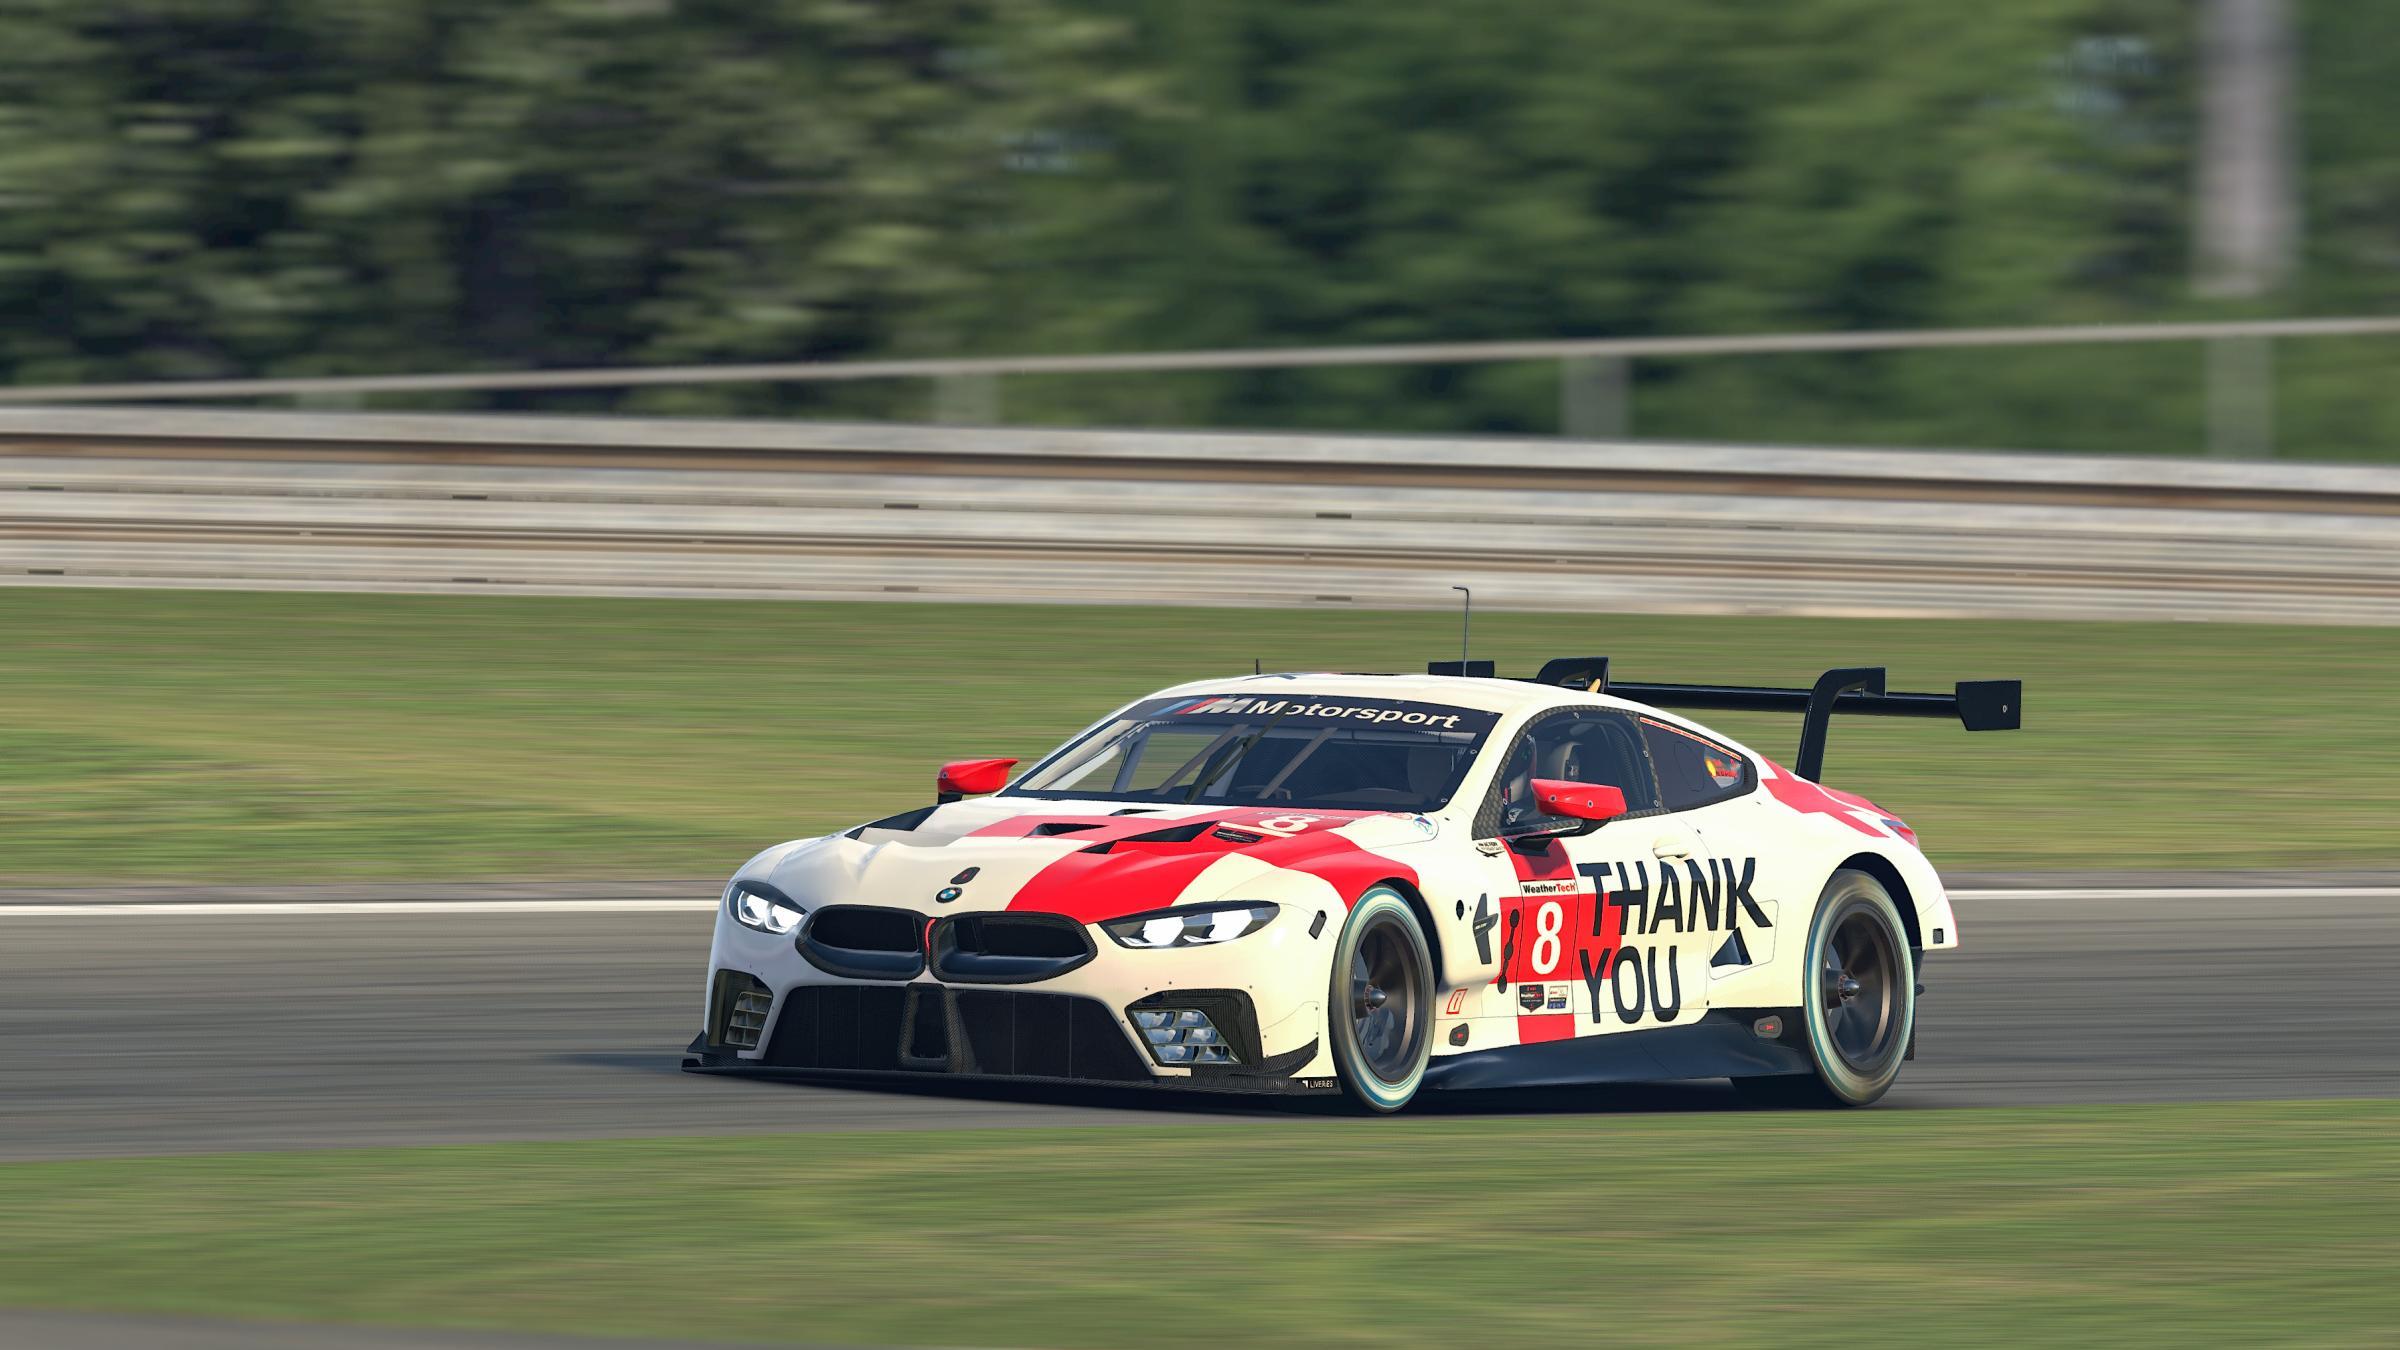 Preview of #RaceLikeAHero - BMW M8 GTE - BMW Motorsport. by BMW Motorsport